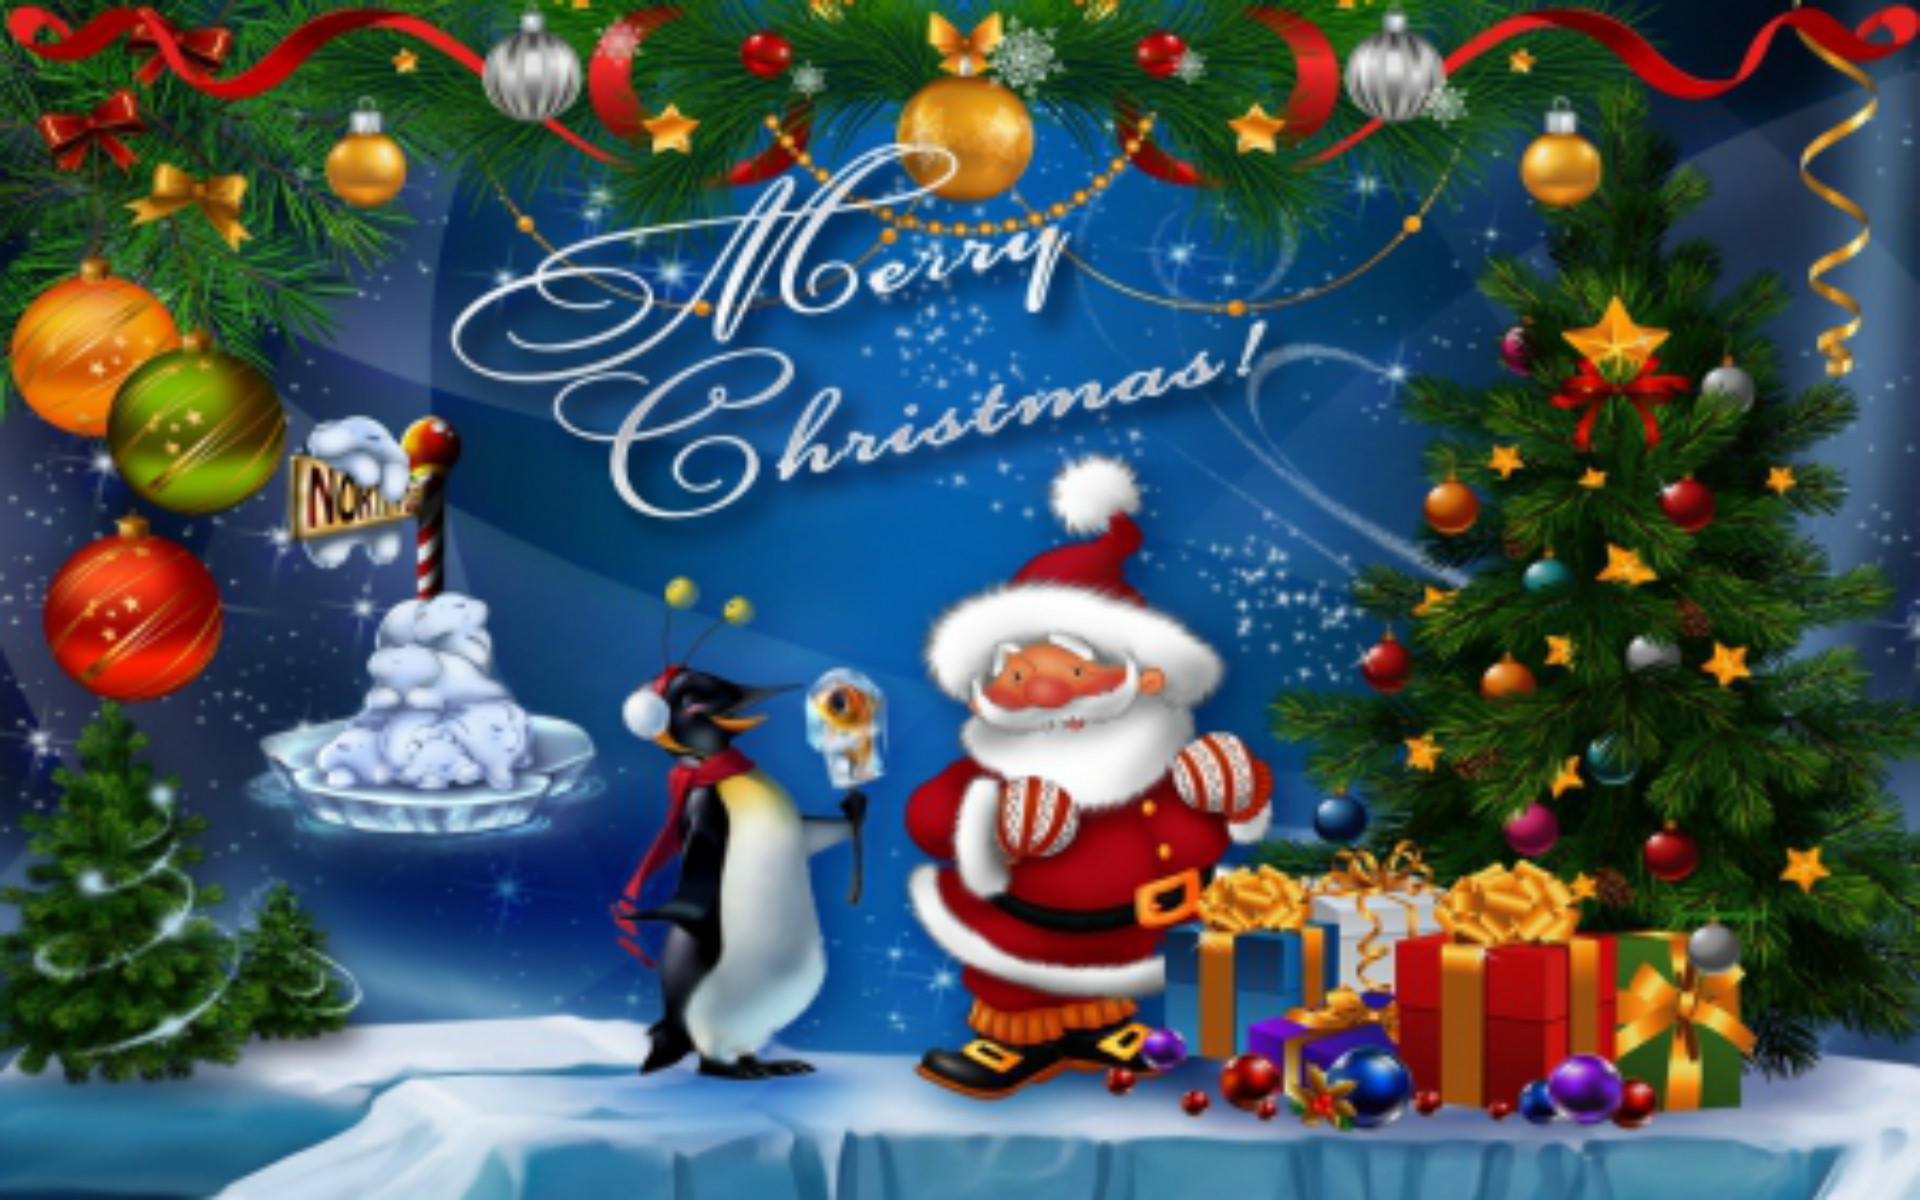 Christmas Background Images Christmas Desktop Wallpaper Merry Christmas Images Hd 1920x1200 Wallpaper Teahub Io